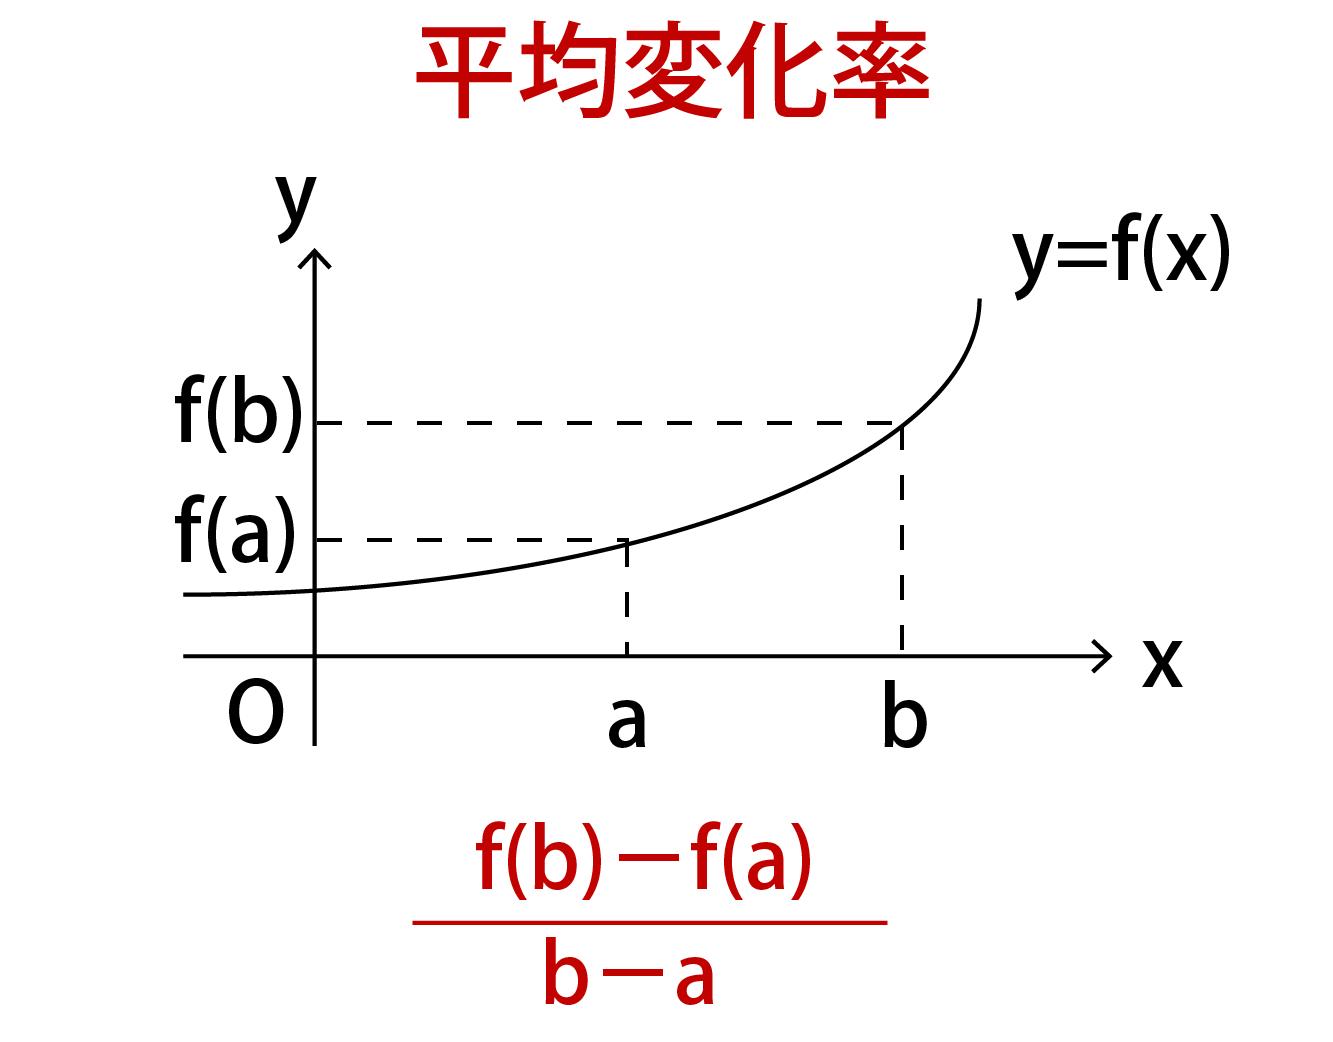 関数f(x)の平均変化率